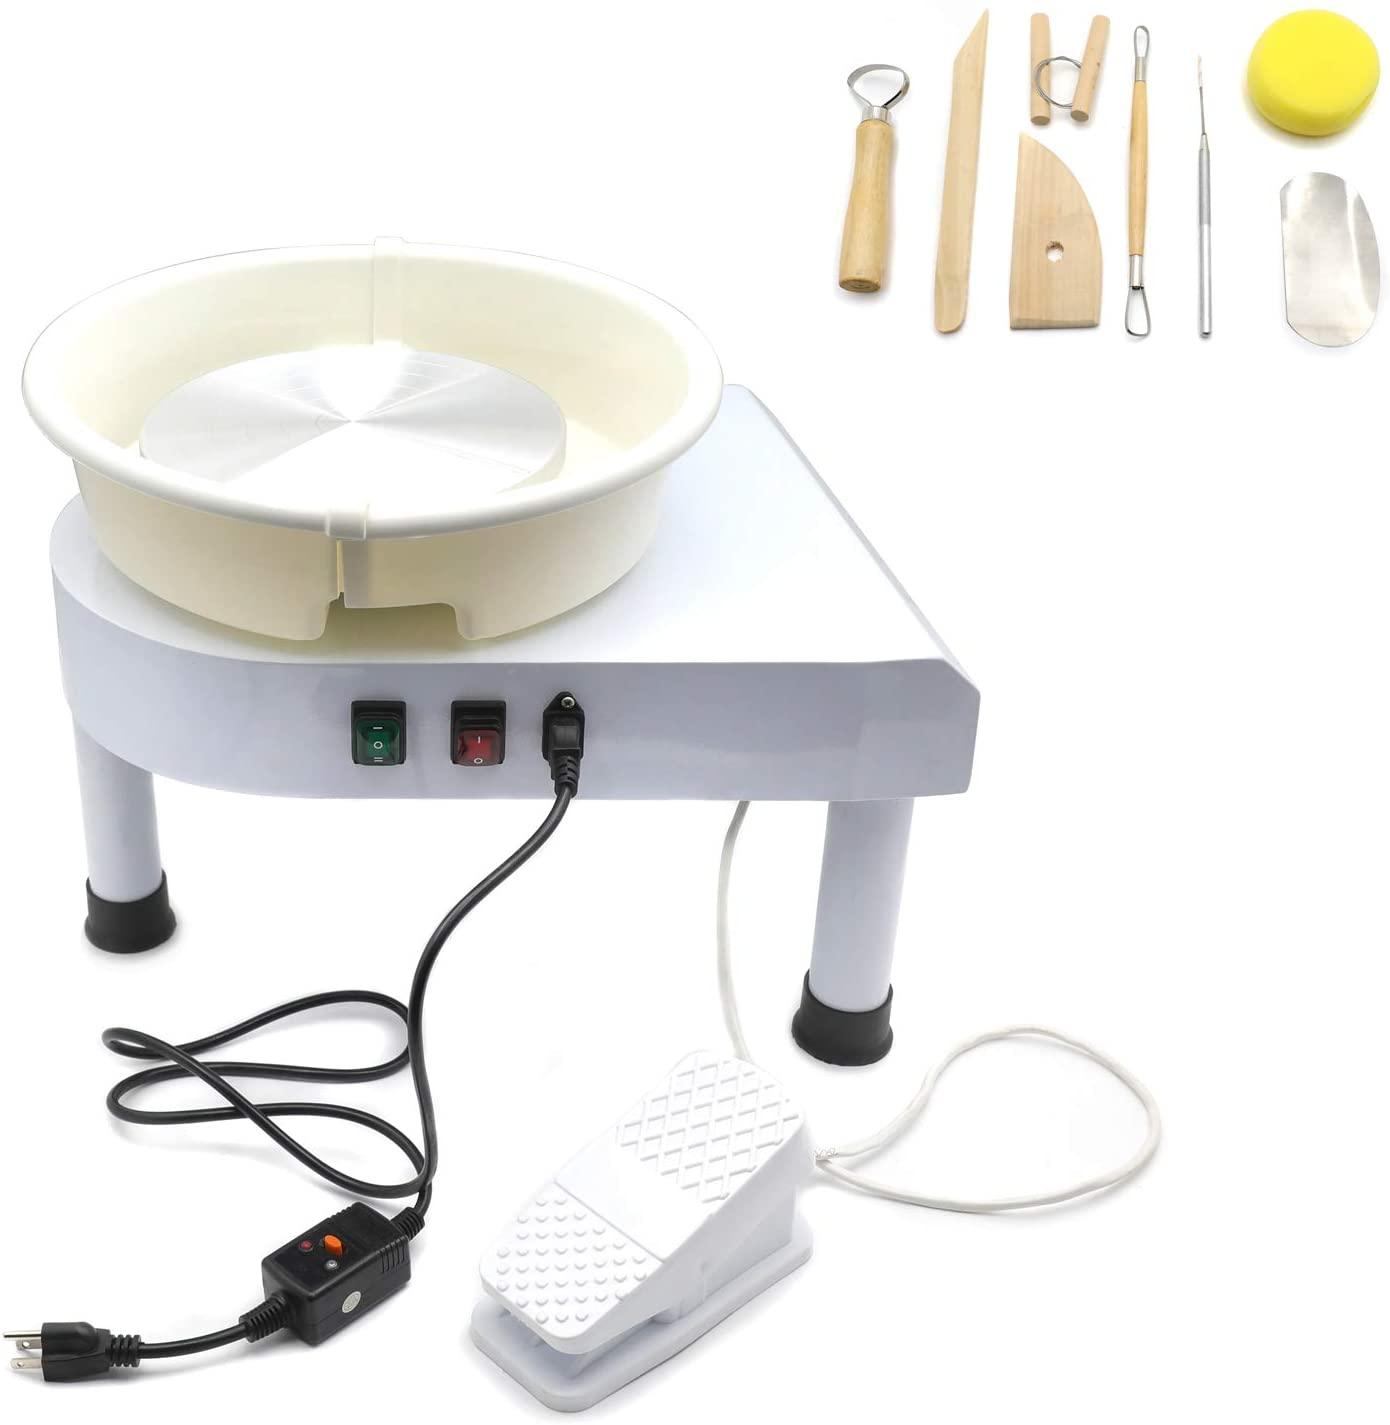 HTTMT- 25CM Triangle Electric Pottery Wheel Ceramic Machine Work Clay Art Craft DIY 110V 350W [P/N: ET-TOOL021-WHITE]